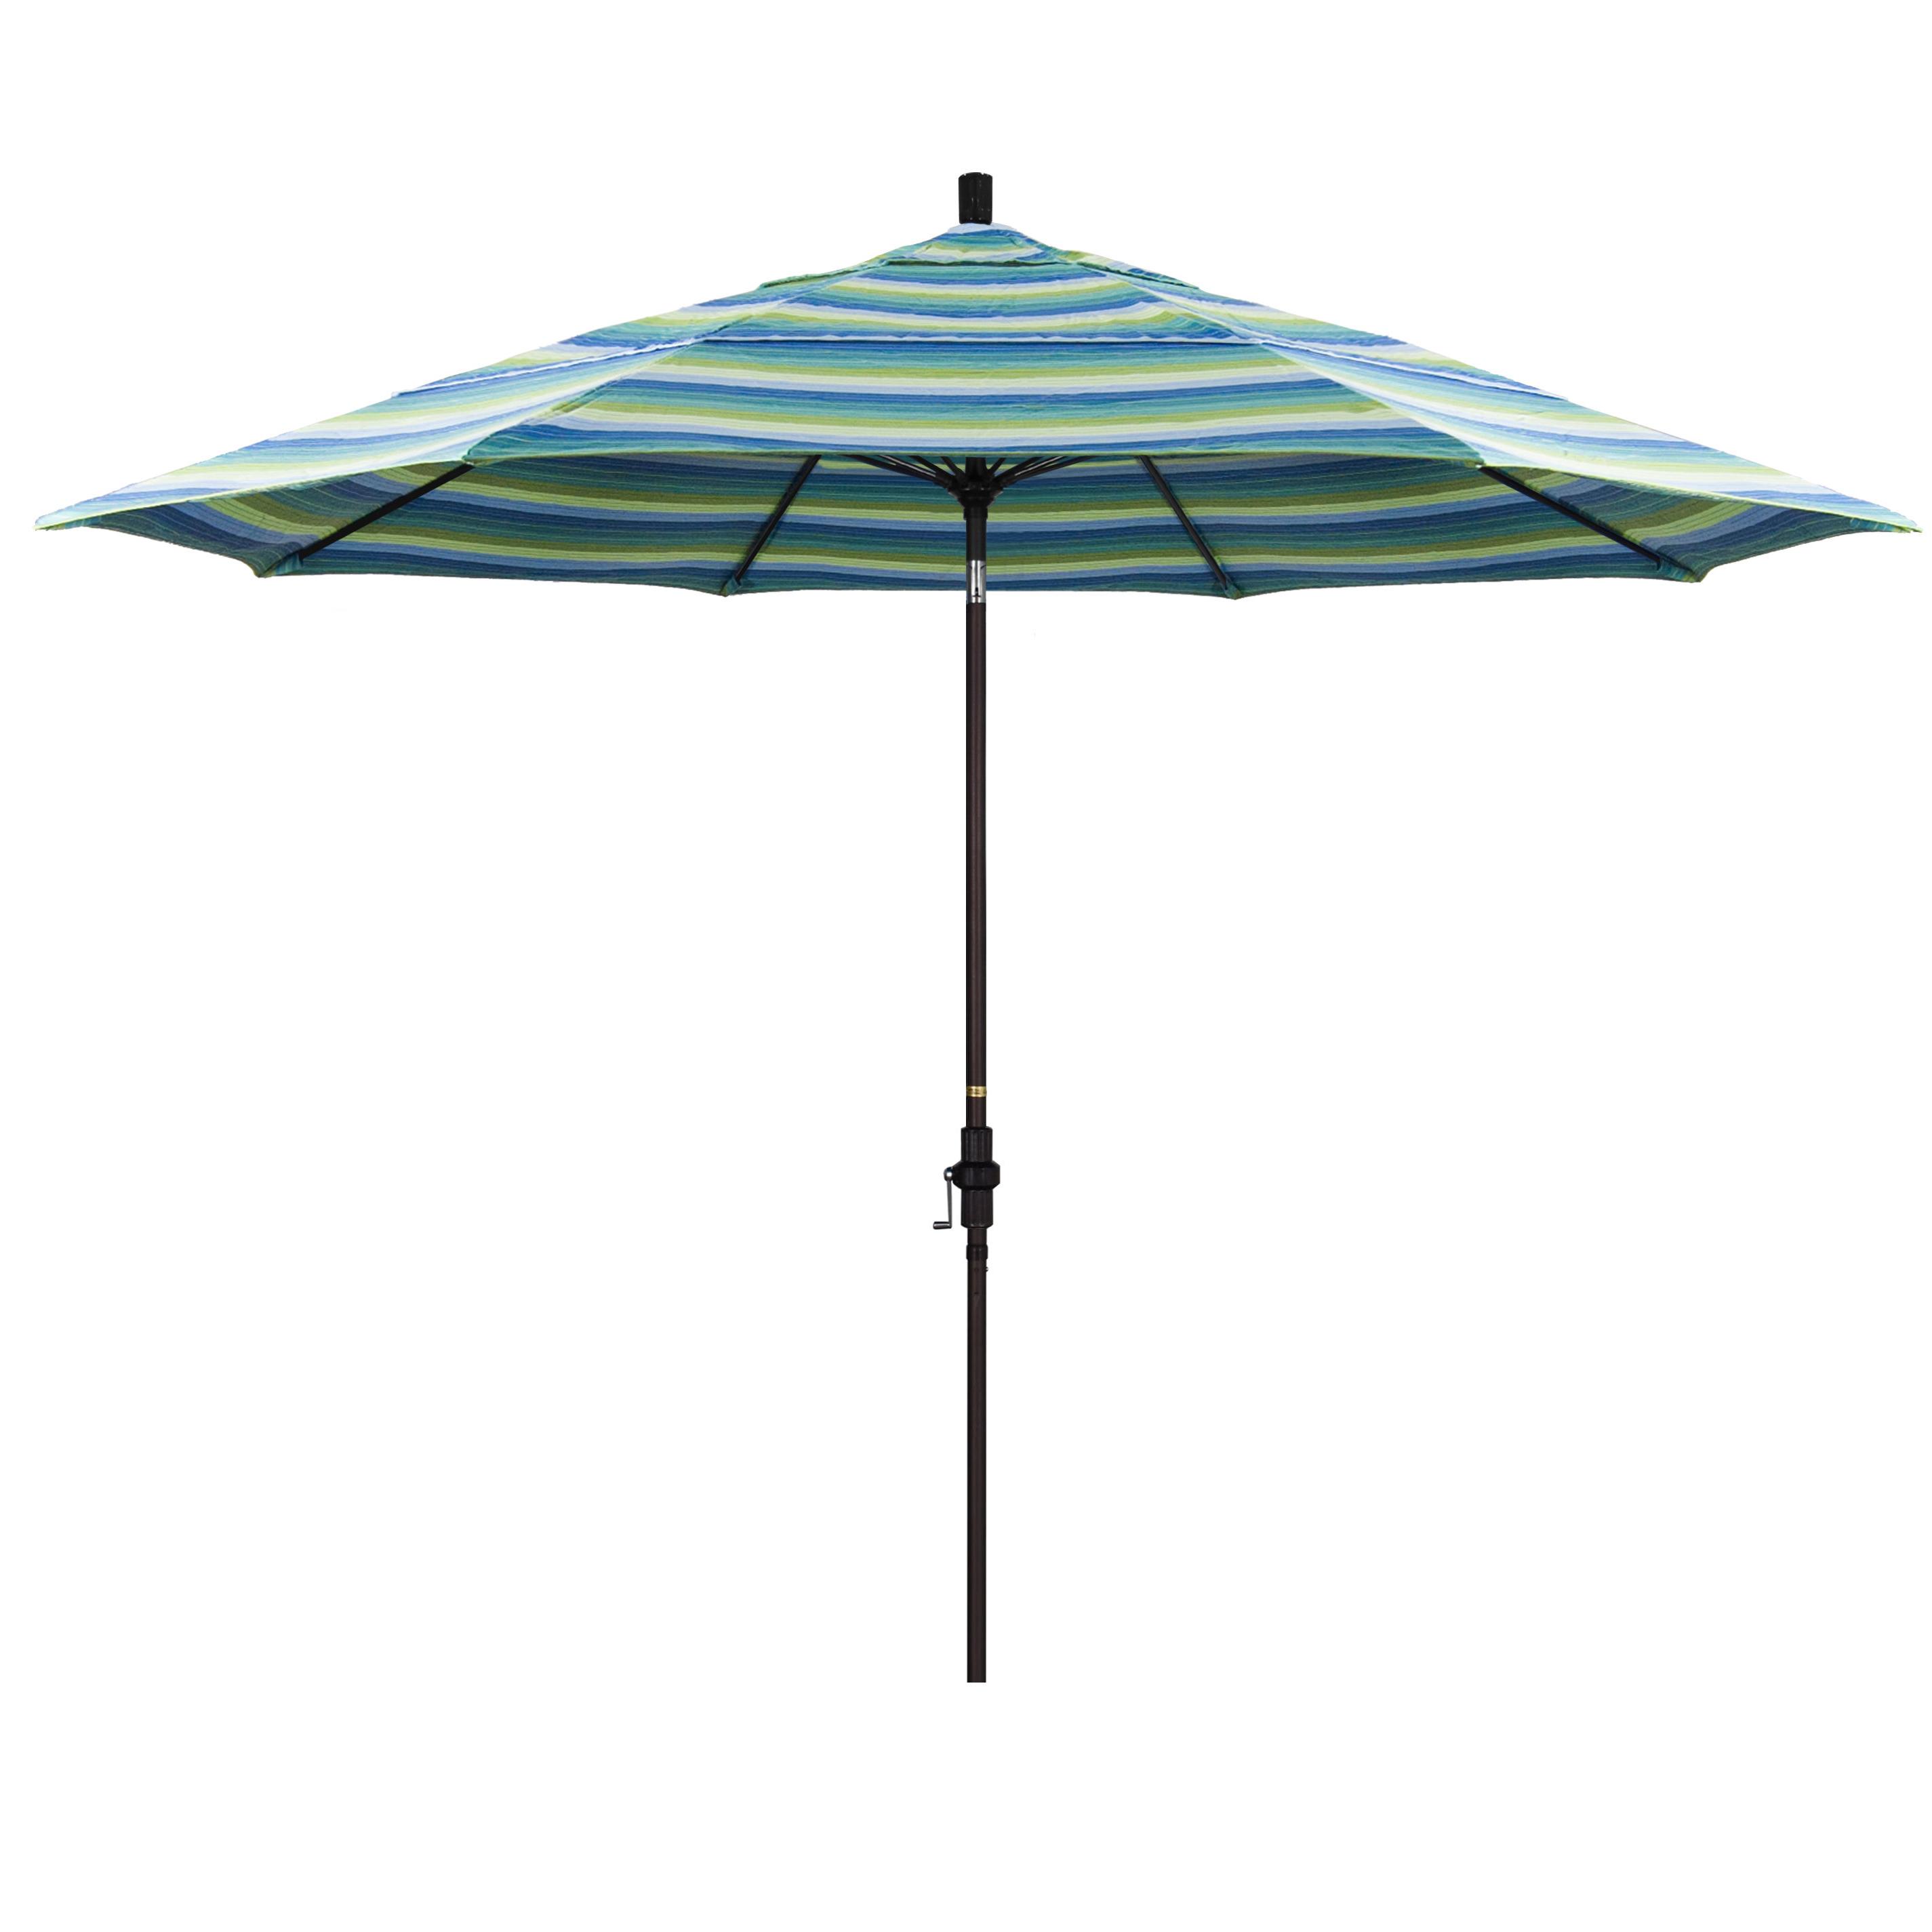 Fashionable Muldoon 11' Market Sunbrella Umbrella With Regard To Muldoon Market Umbrellas (View 4 of 20)